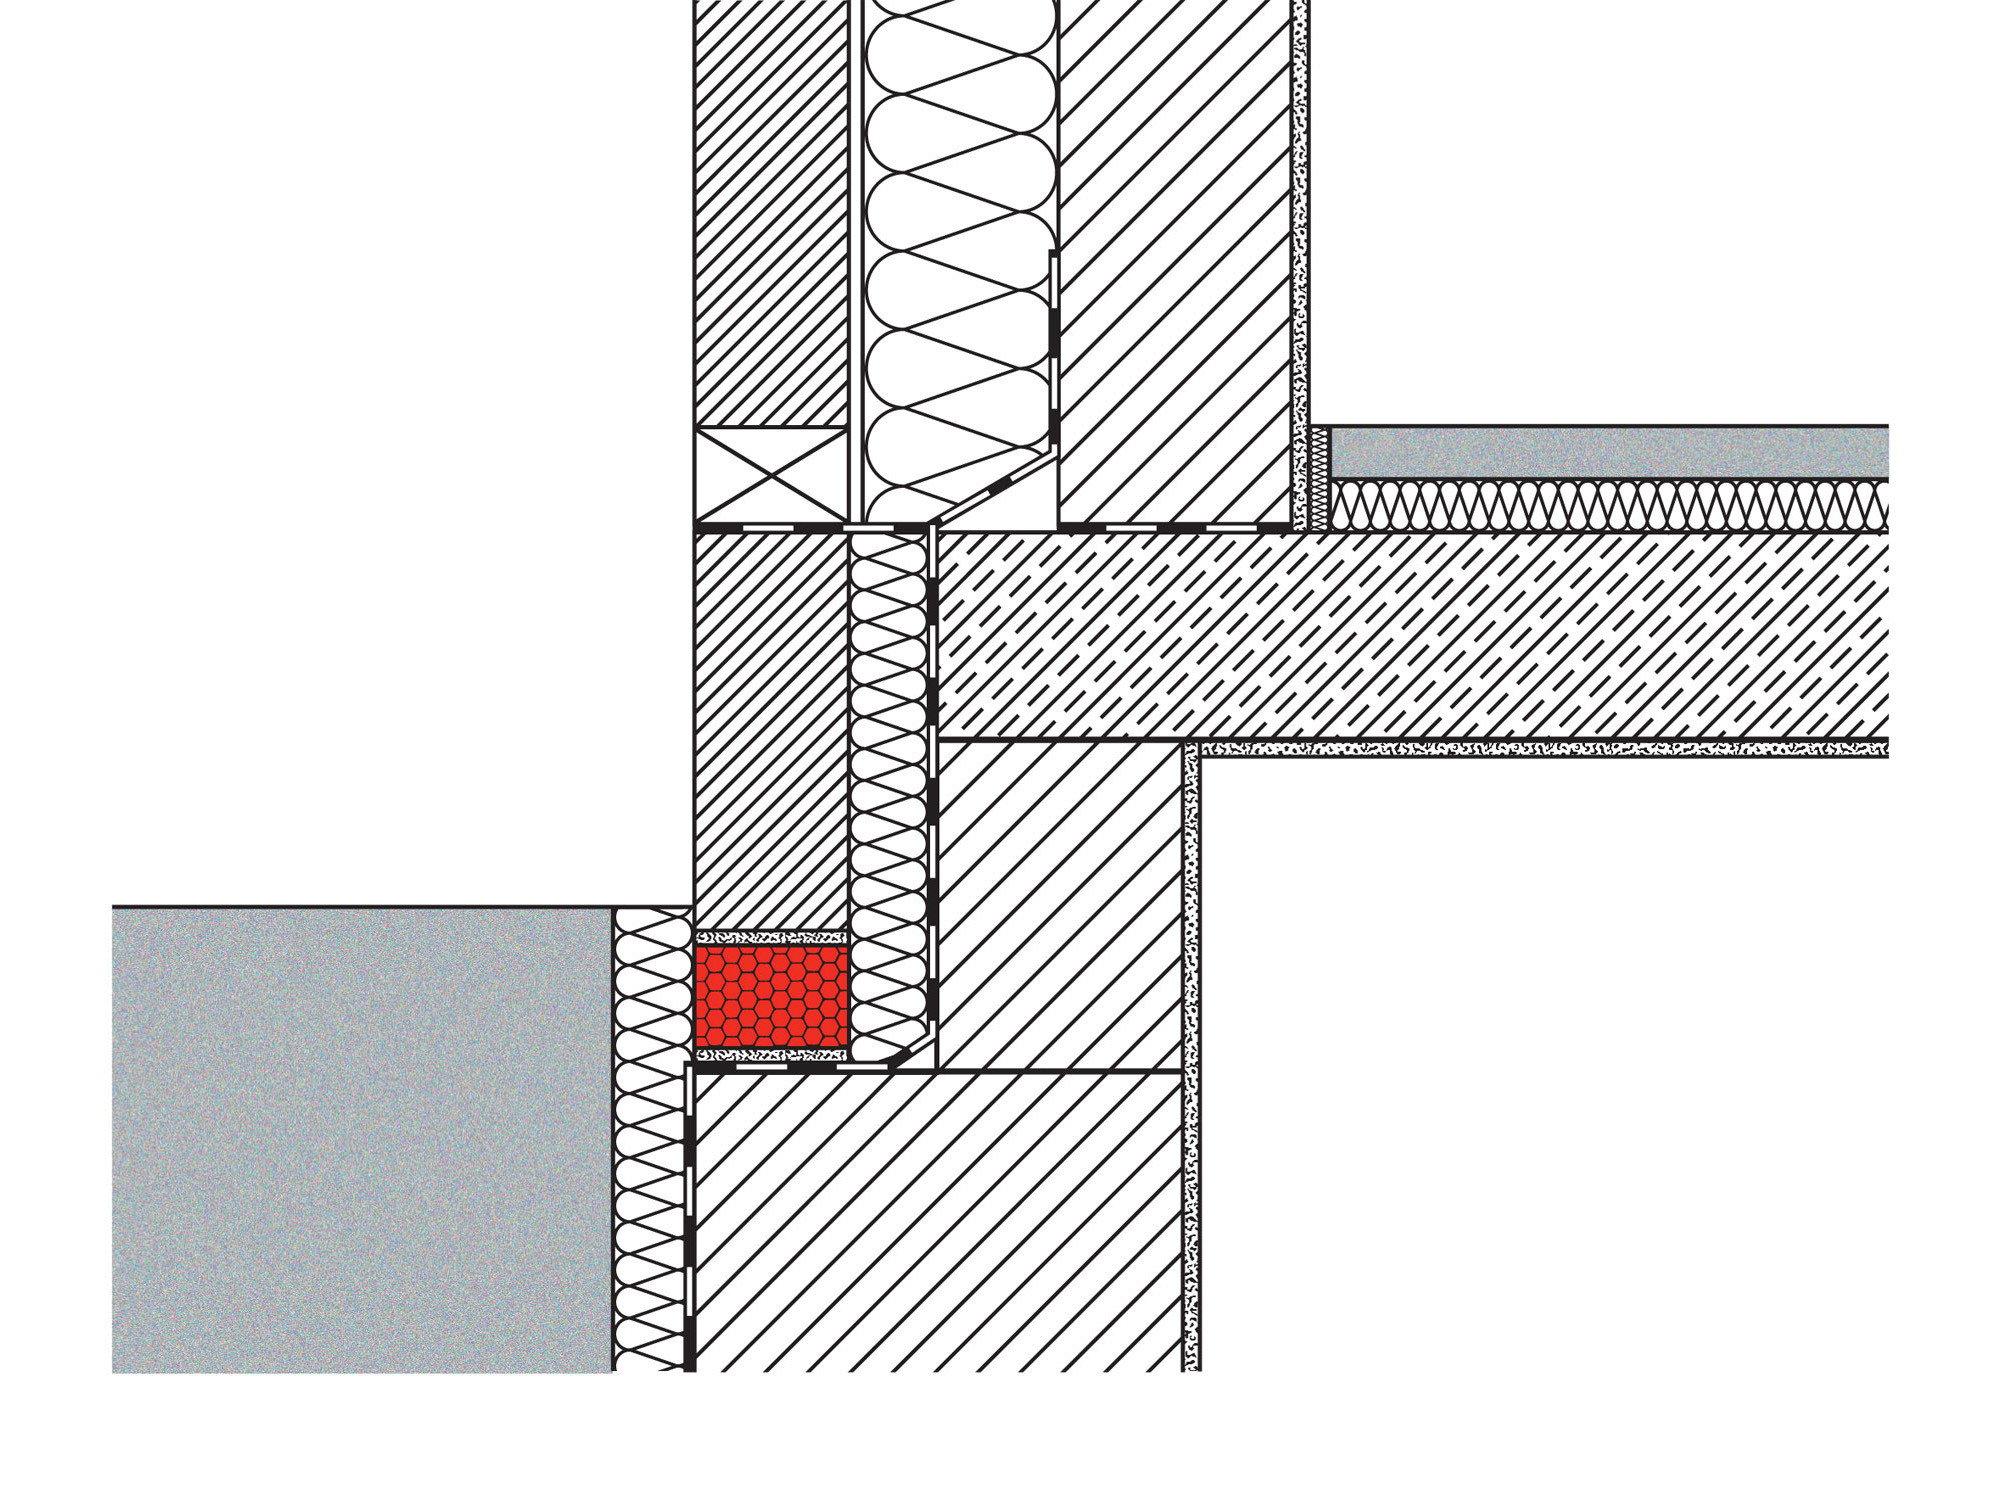 bodenplatte aufbau aufbau boden hinter dem berg bodenplatte aufbau electron aufbau. Black Bedroom Furniture Sets. Home Design Ideas